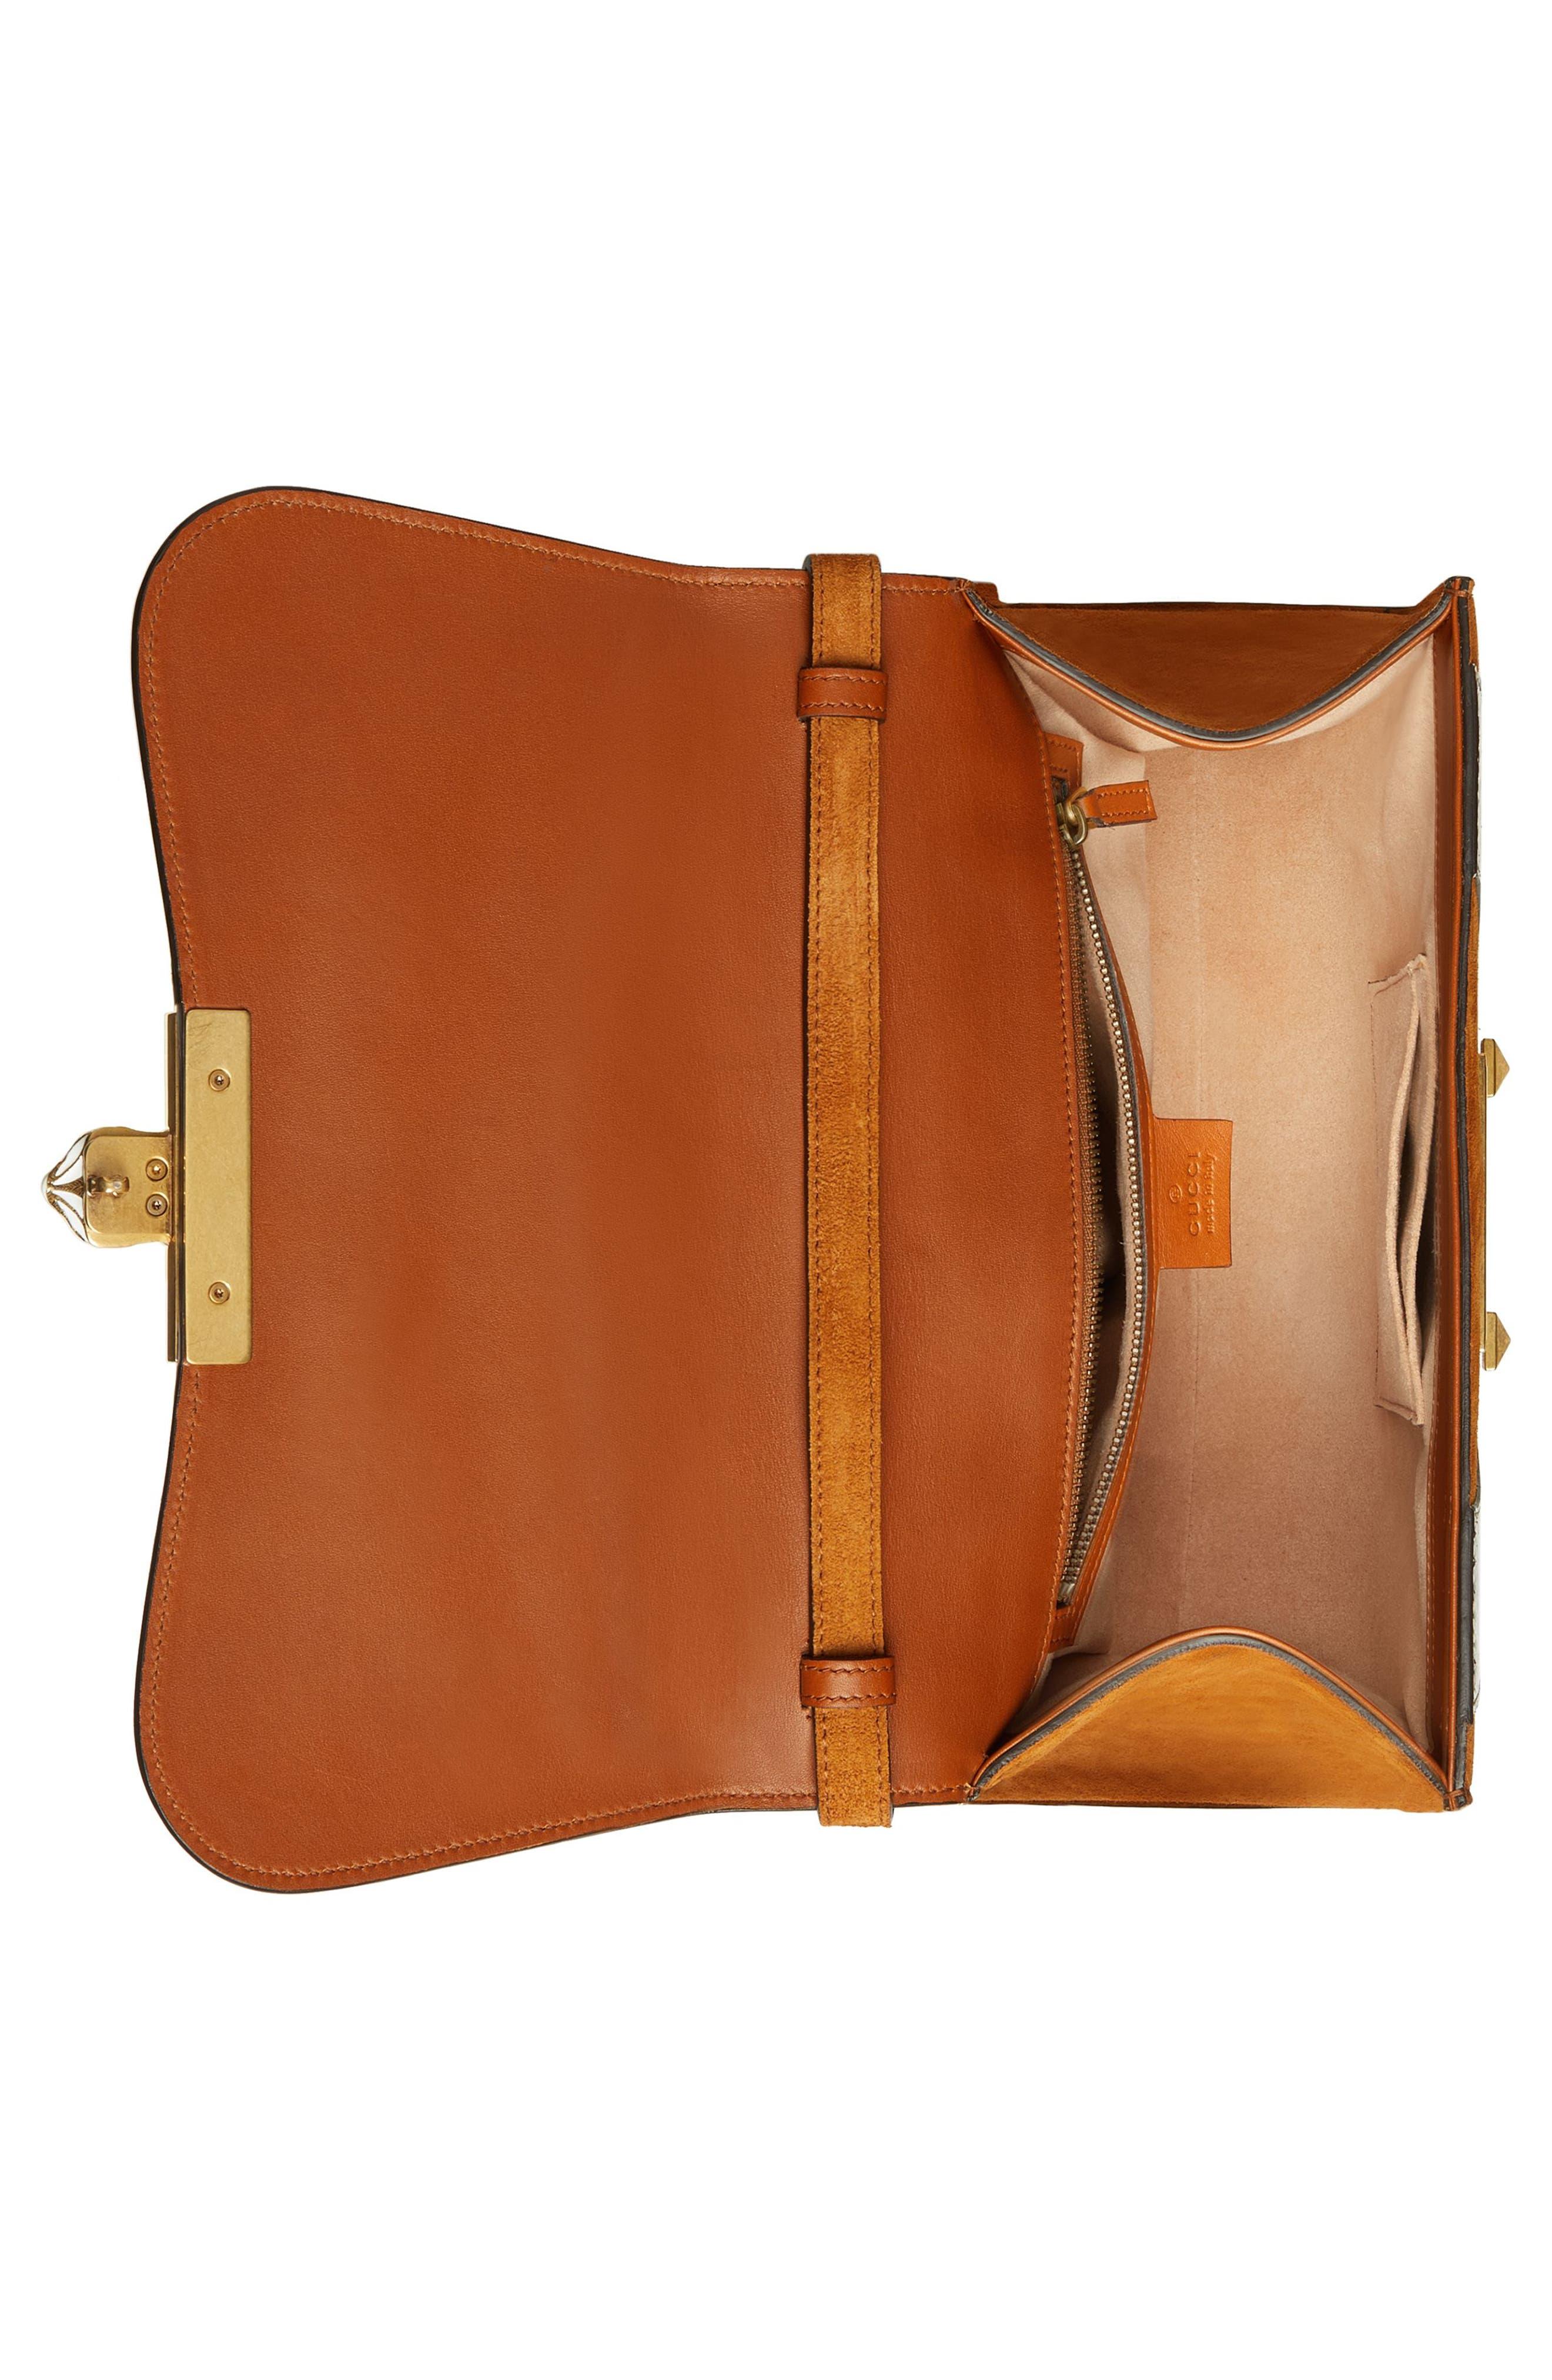 Small Osiride Leather & Canvas Top Handle Satchel,                             Alternate thumbnail 3, color,                             Bright Cuir/ Roccia